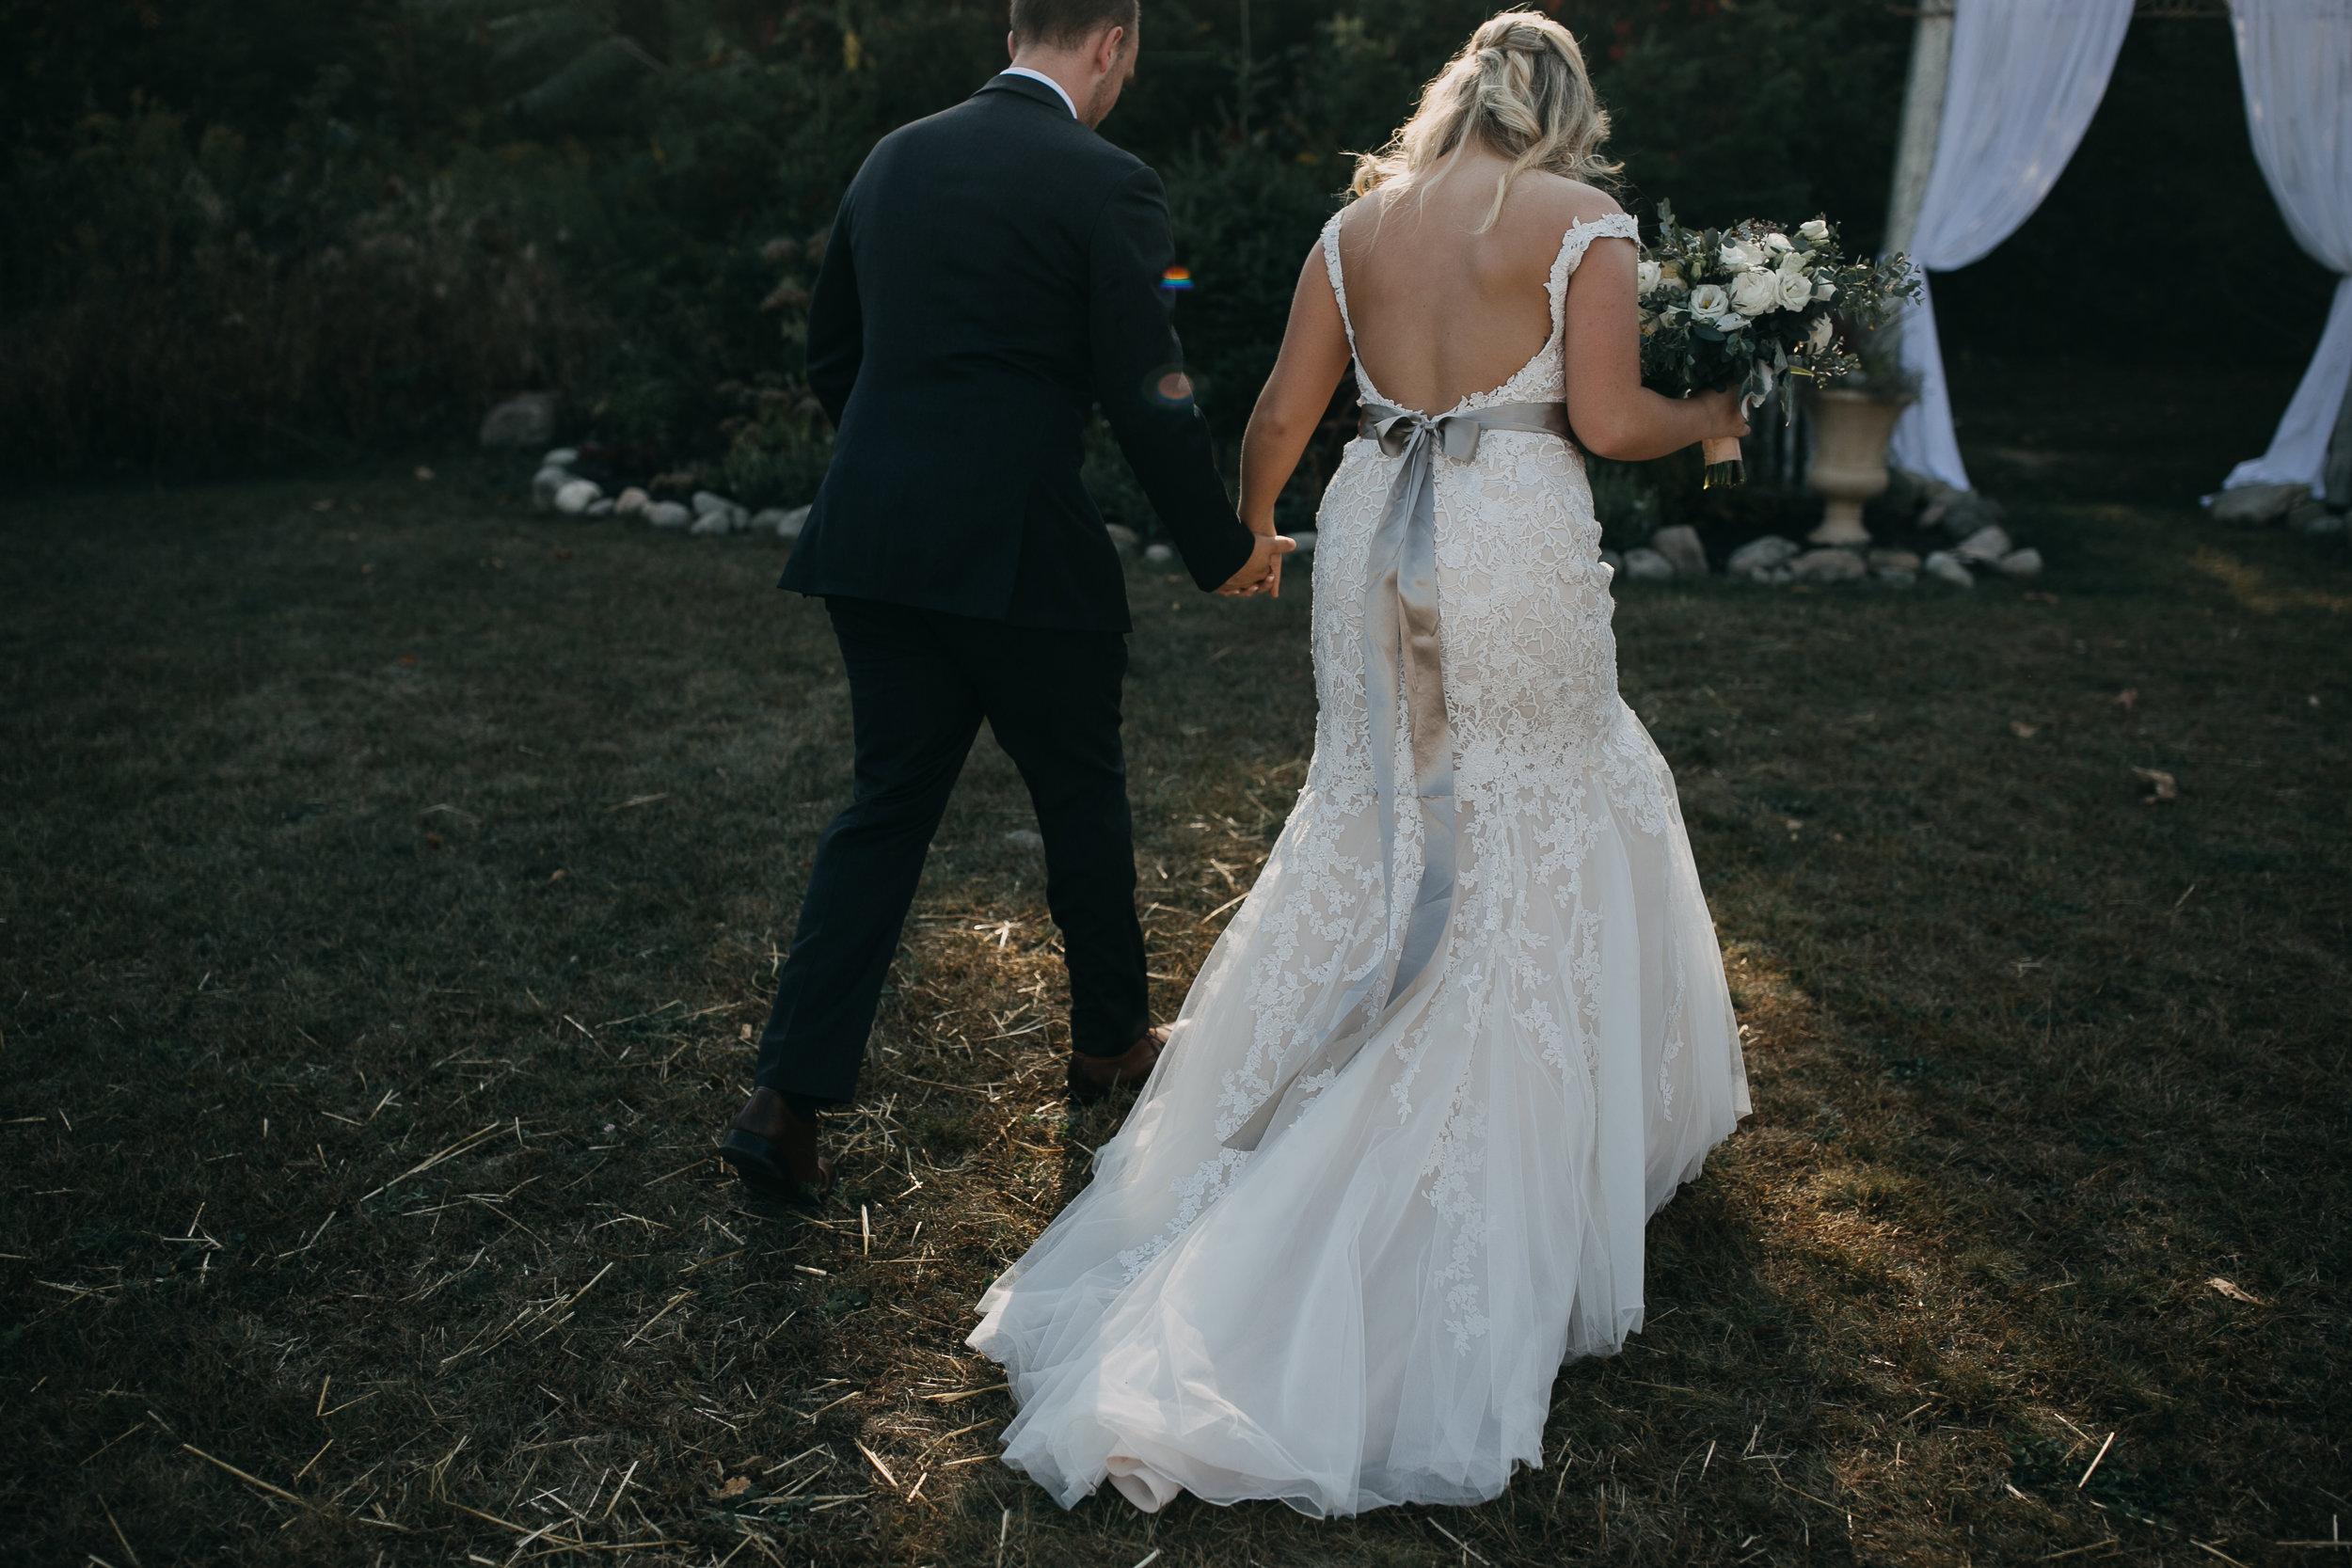 27 bride and groom announced.jpg